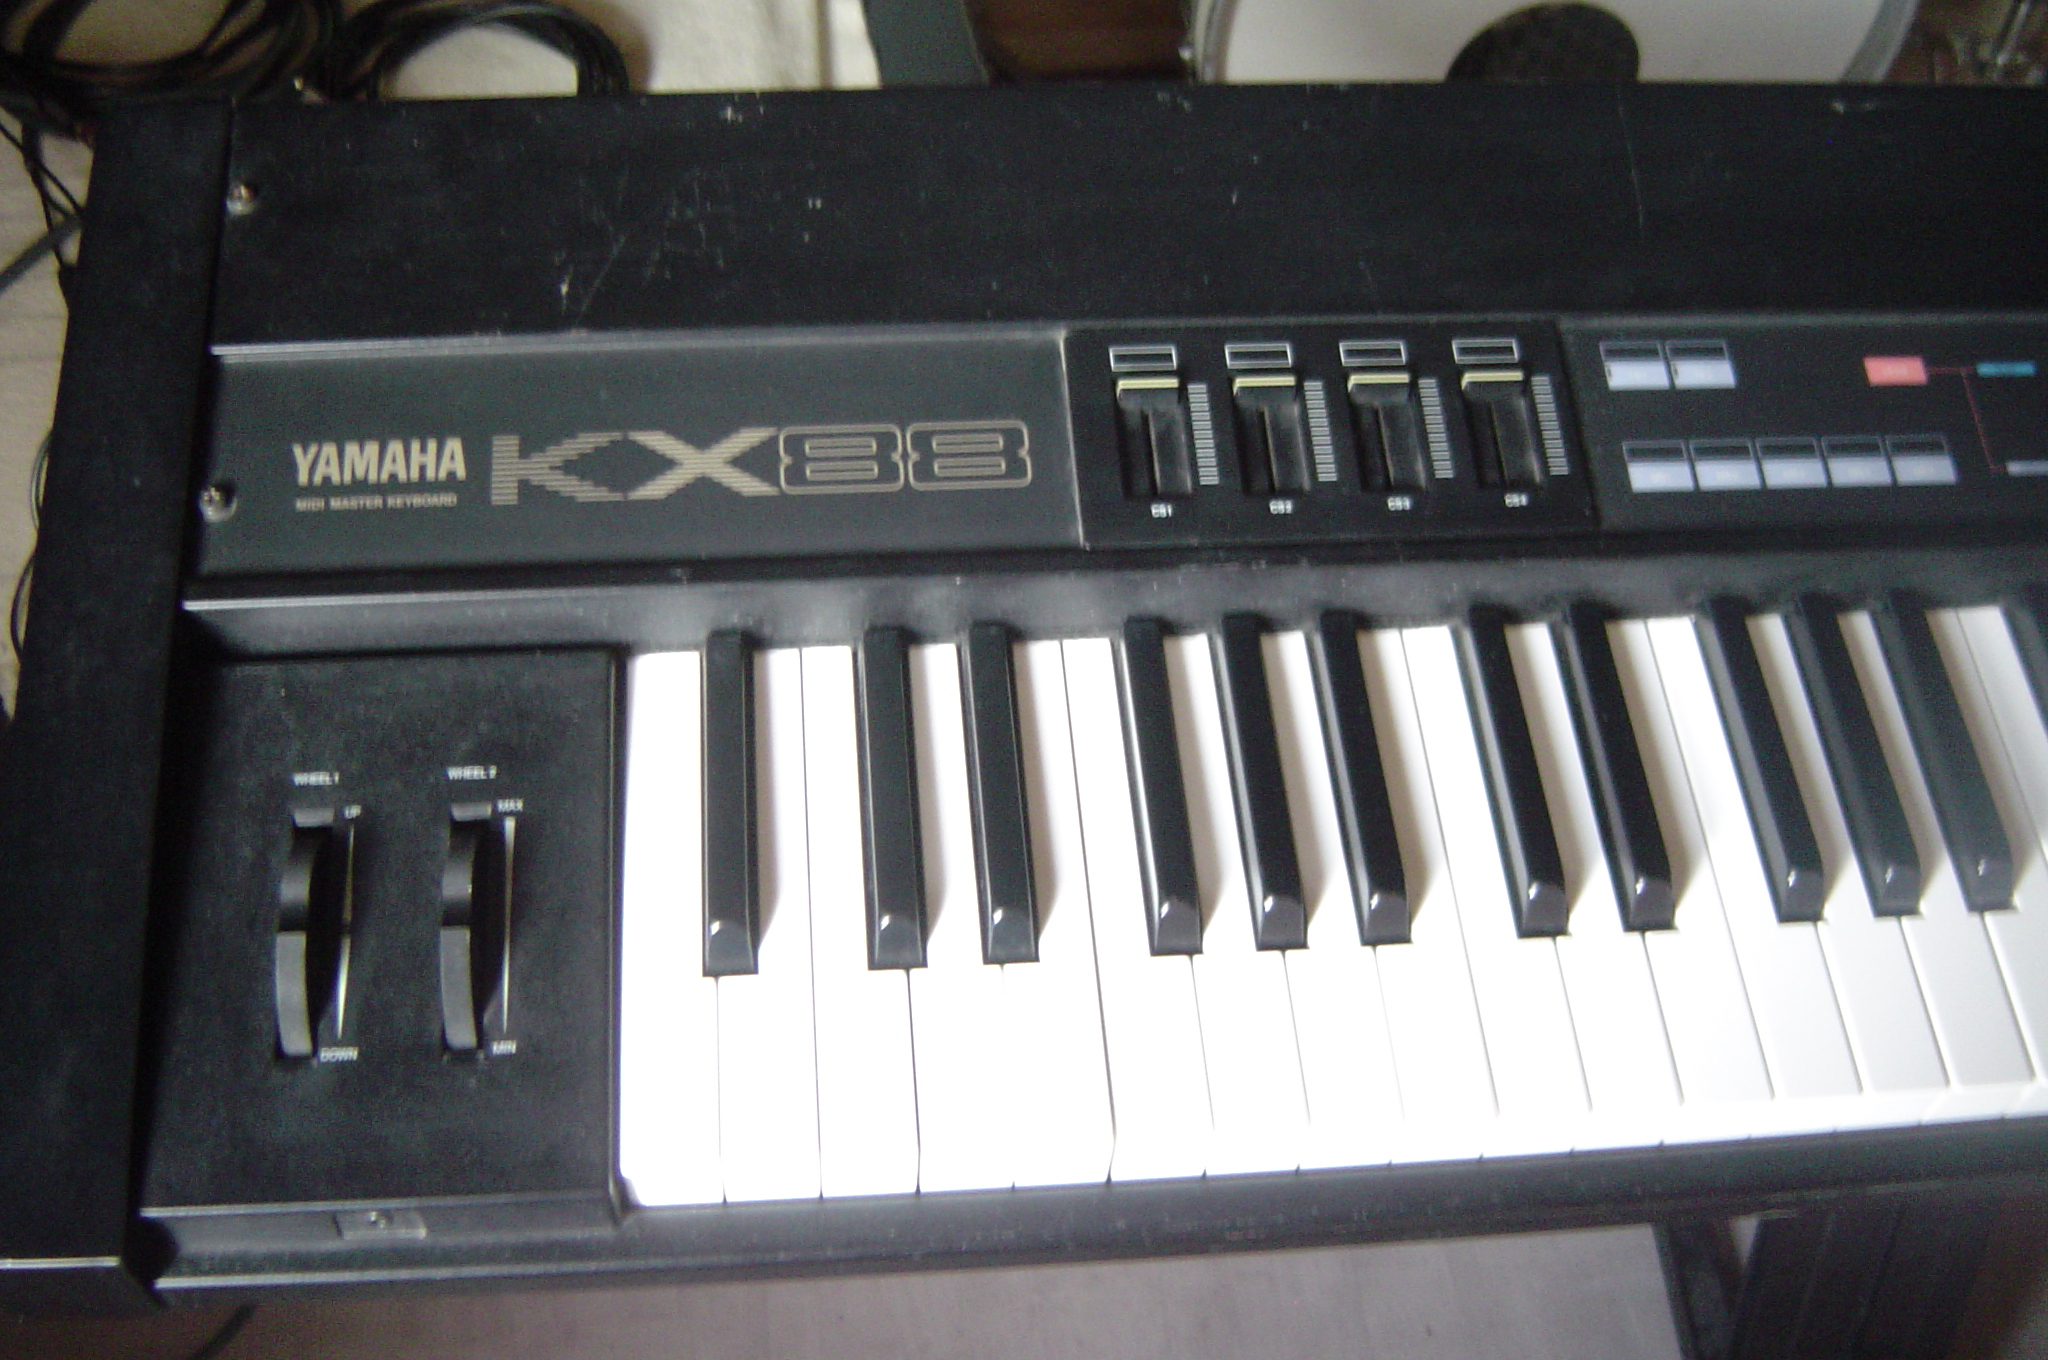 Yamaha kx88 image 309127 audiofanzine for Yamaha midi controller keyboard